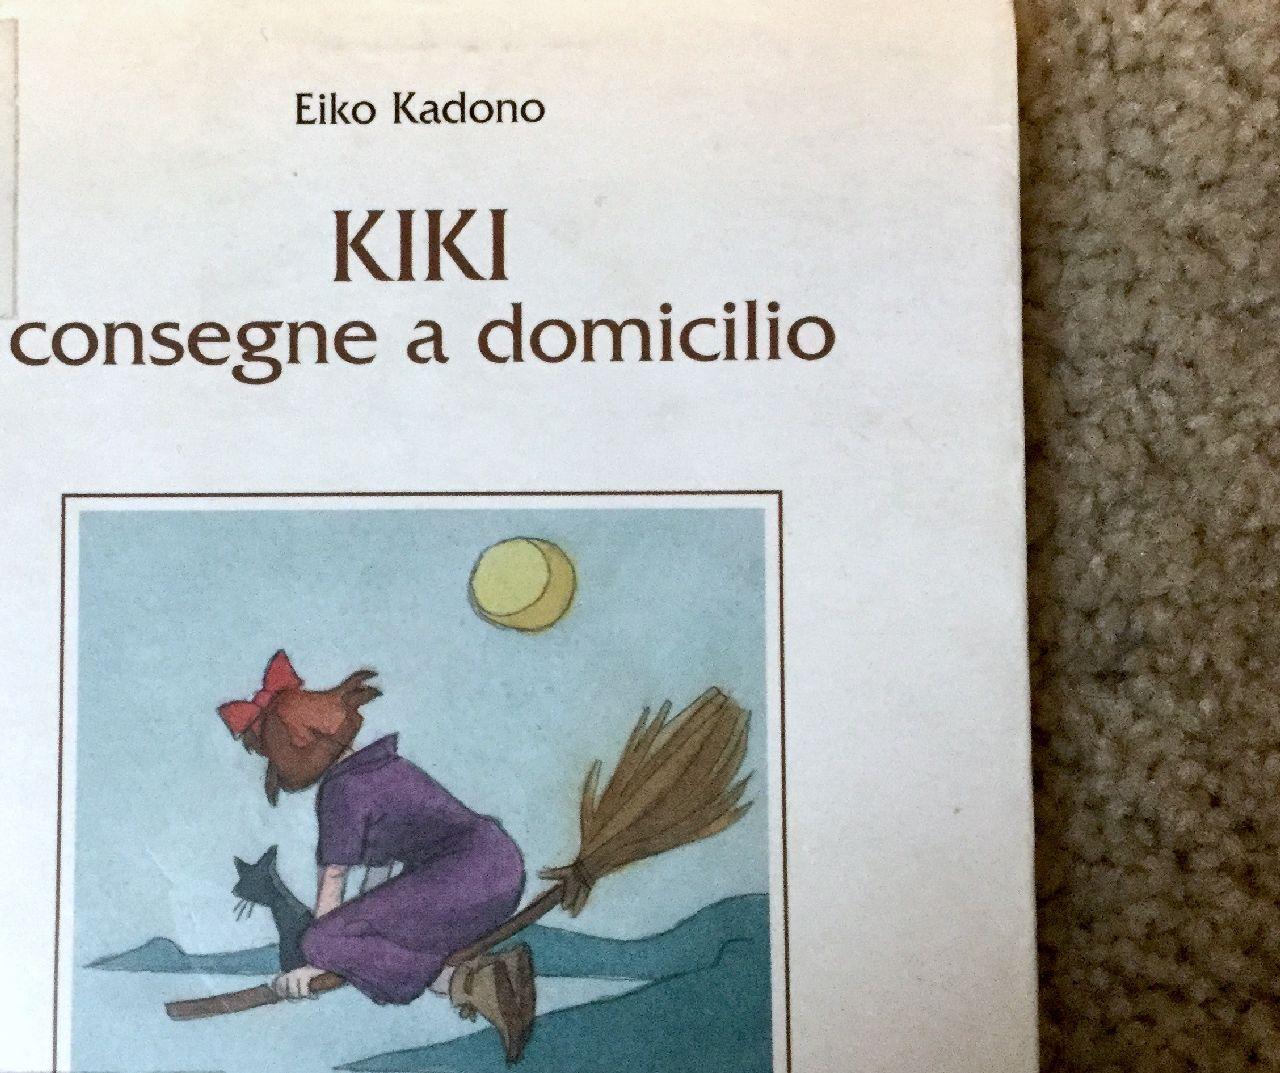 Eiko Kadono, Kiki consegne a domicilio, Kappalab